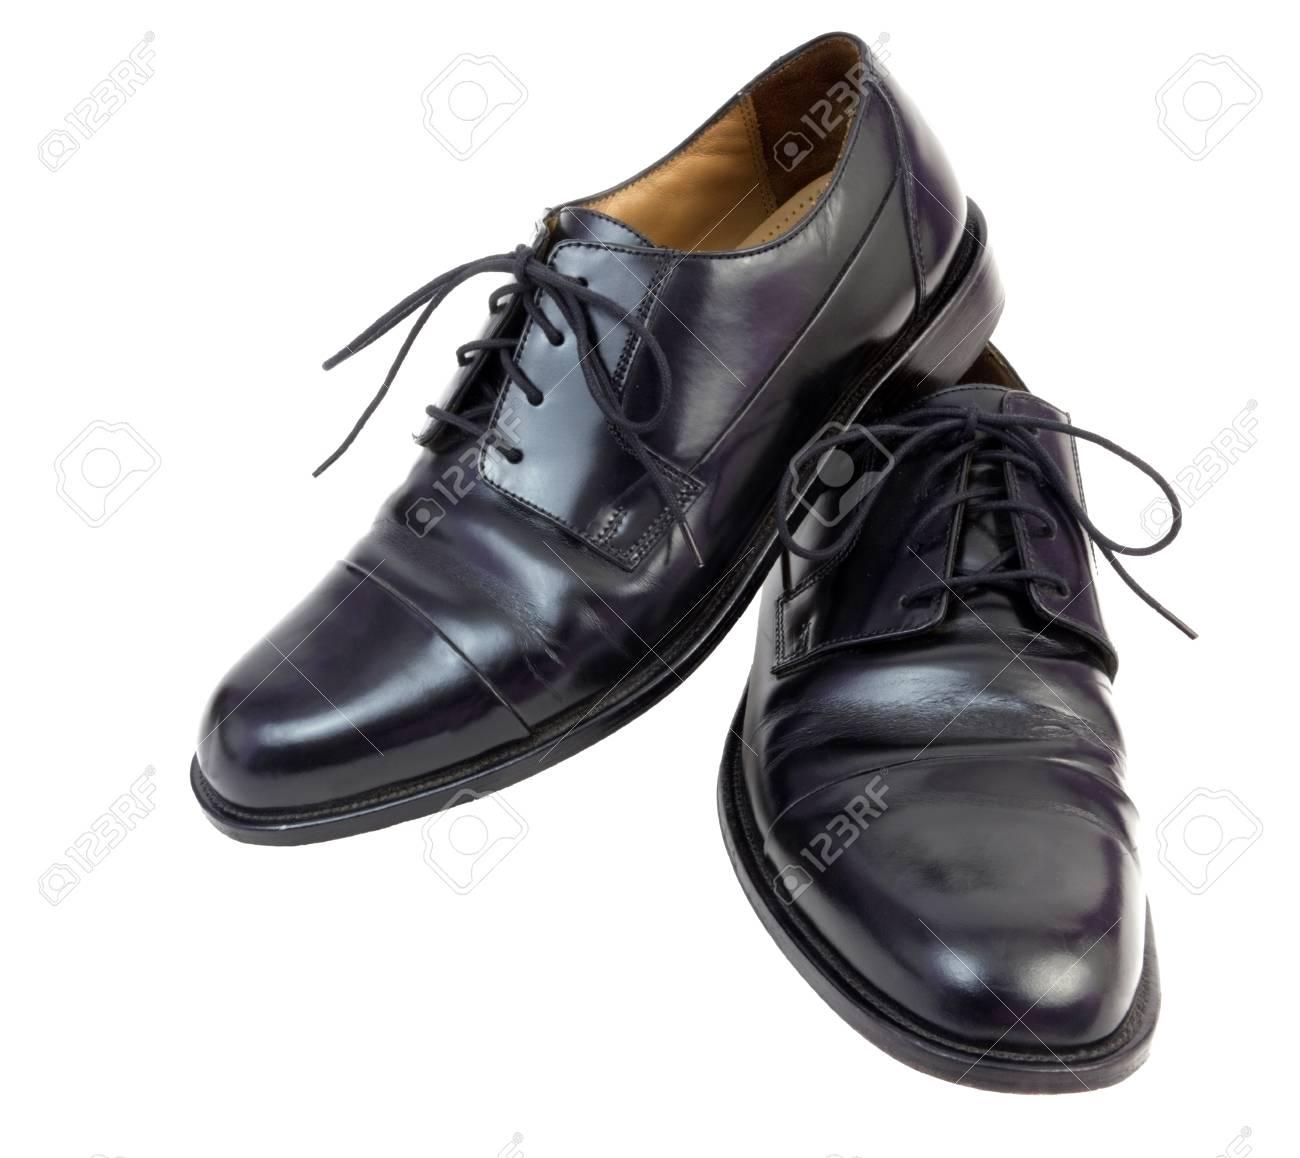 Shiny Black Men's Dress Shoes. Isolated